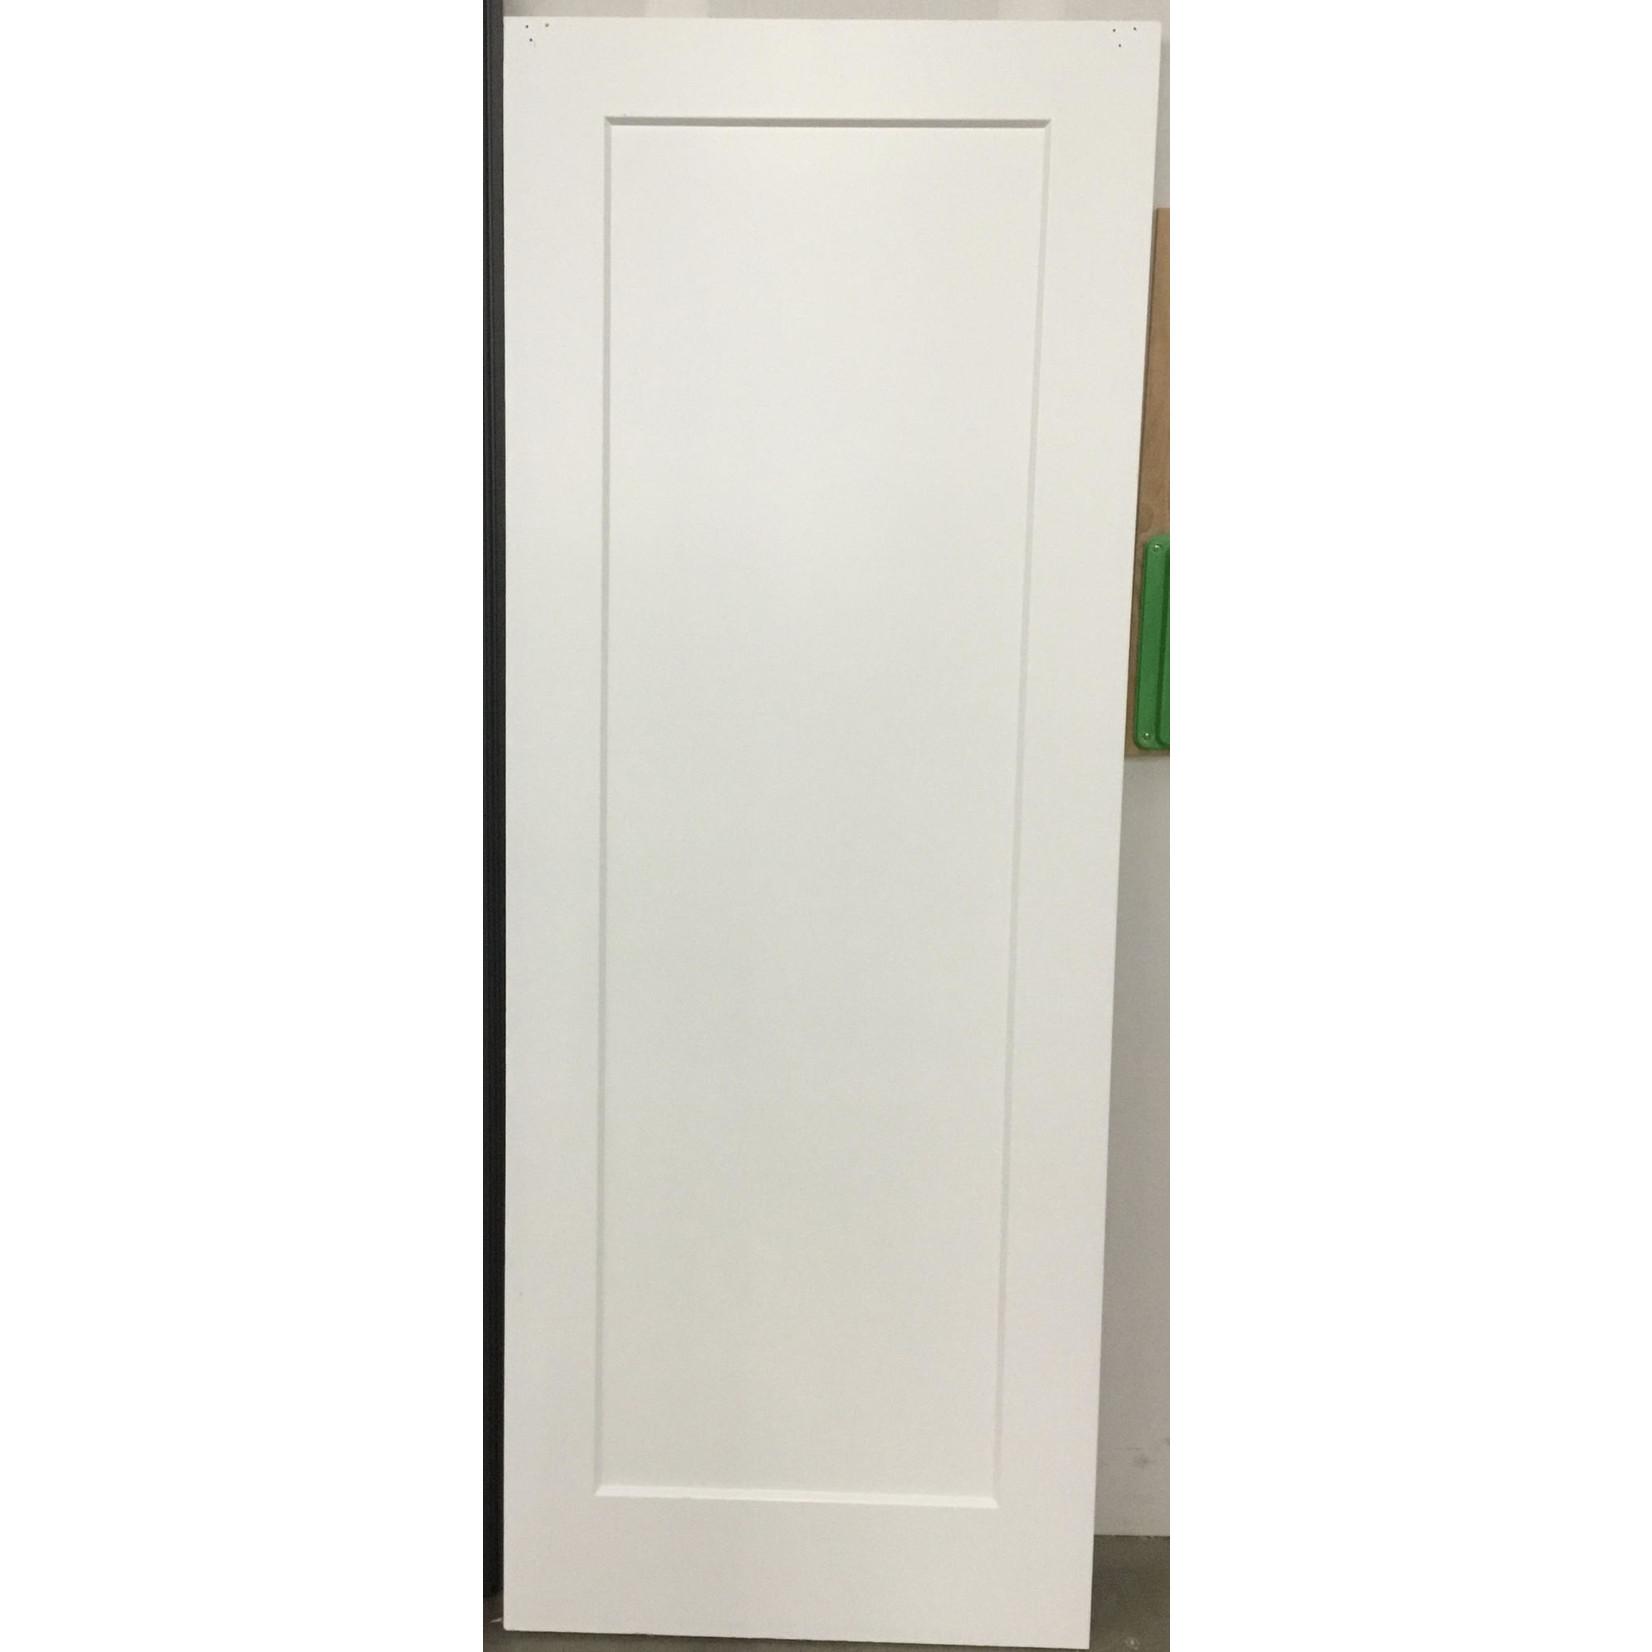 10621 Lightly used Single panel shaker primed door slab